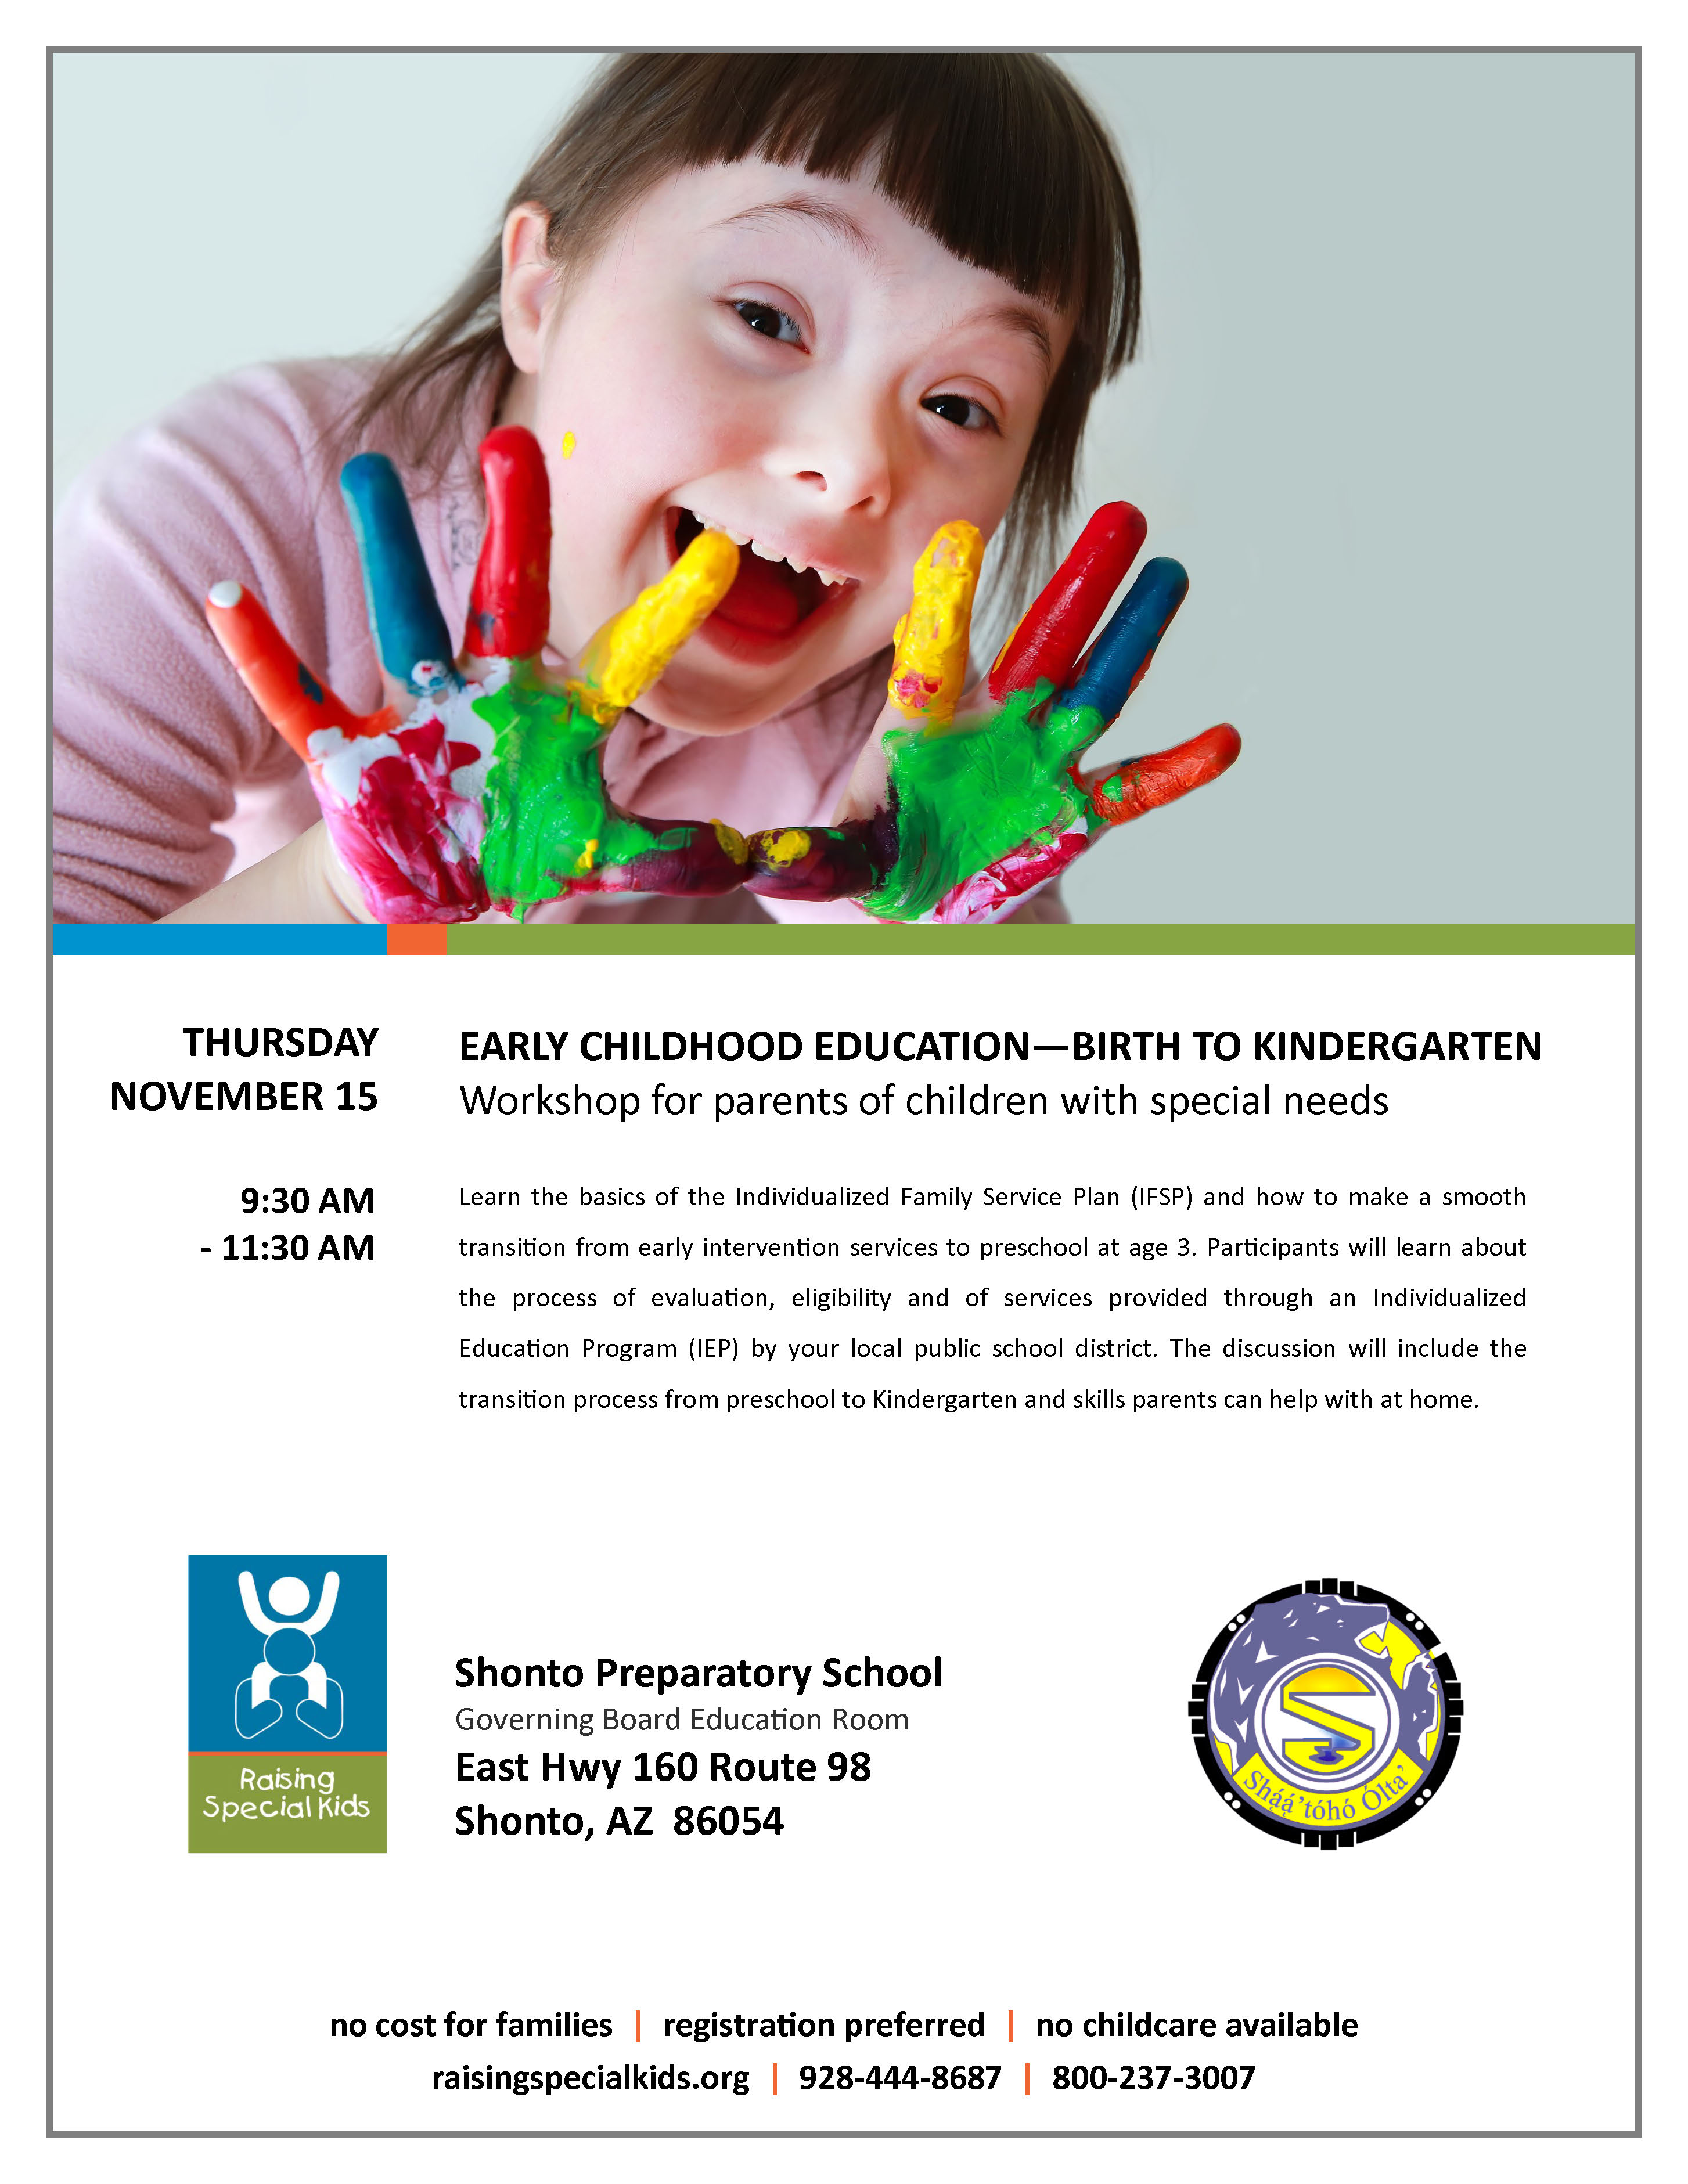 Shonto Preparatory School Early Childhood Education Workshop